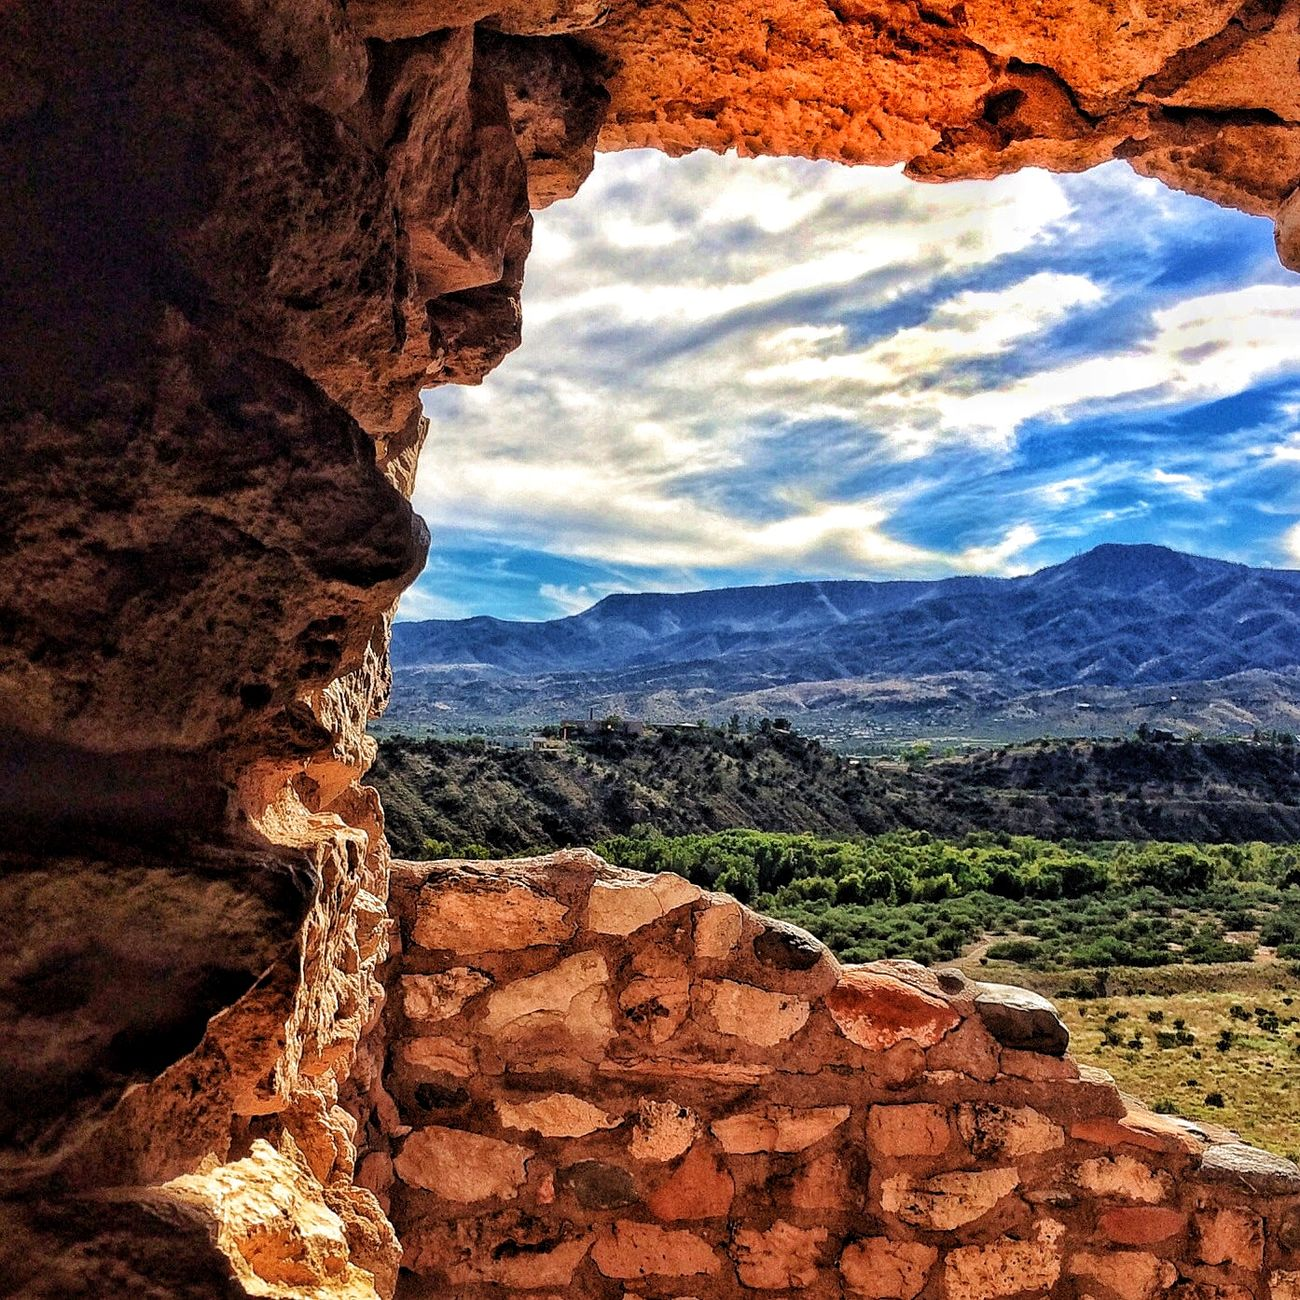 Beauty In Nature Ladyphotographerofthemonth The Great Outdoors - 2017 EyeEm Awards Arizona Arizona Landscape